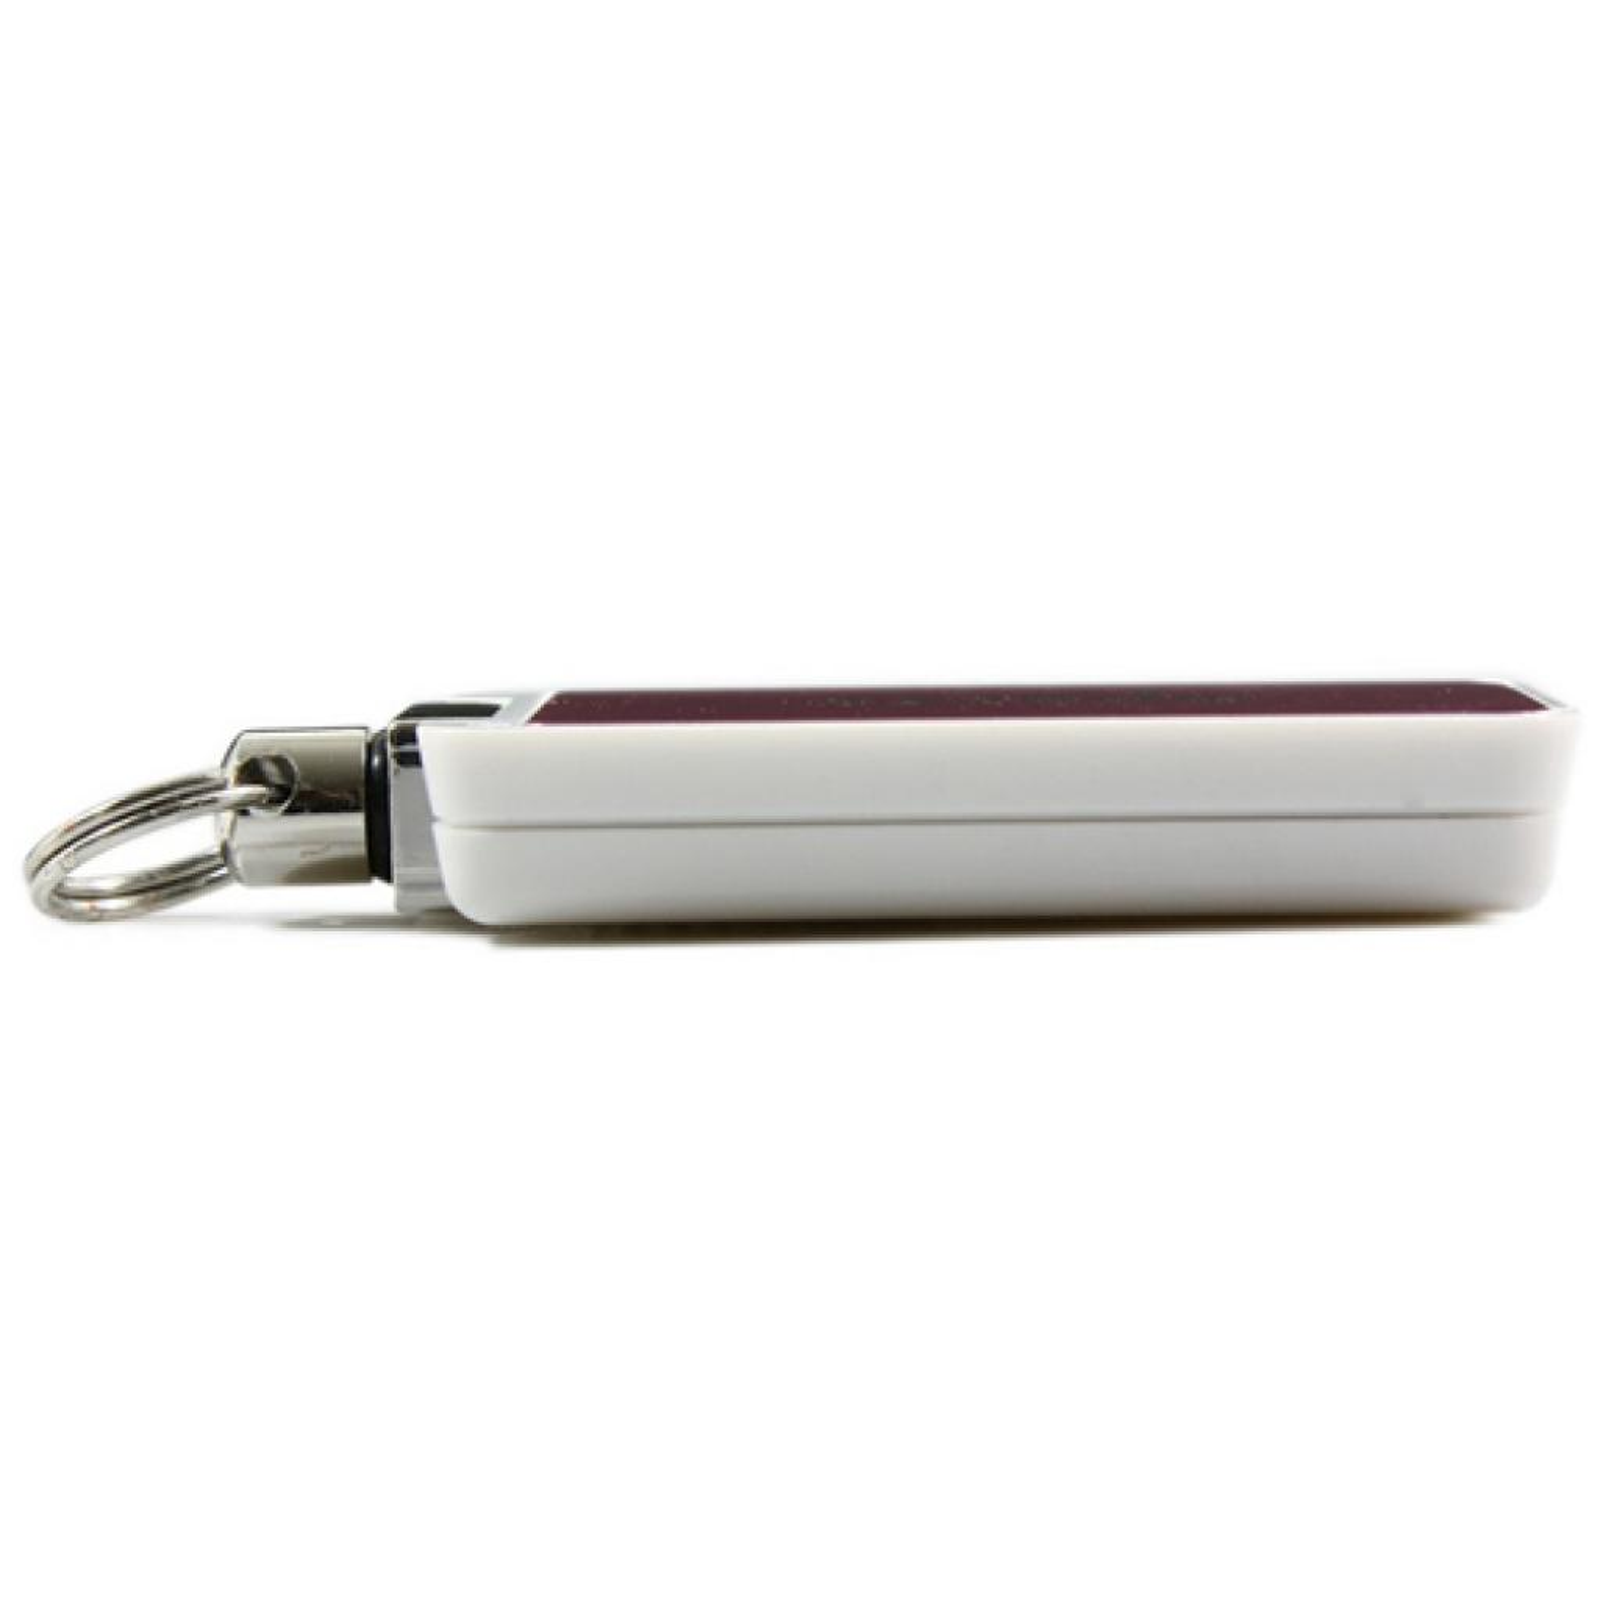 USB флеш накопитель 8GB AH129 Tiffany Blue RP USB2.0 Apacer (AP8GAH129G-1) изображение 4